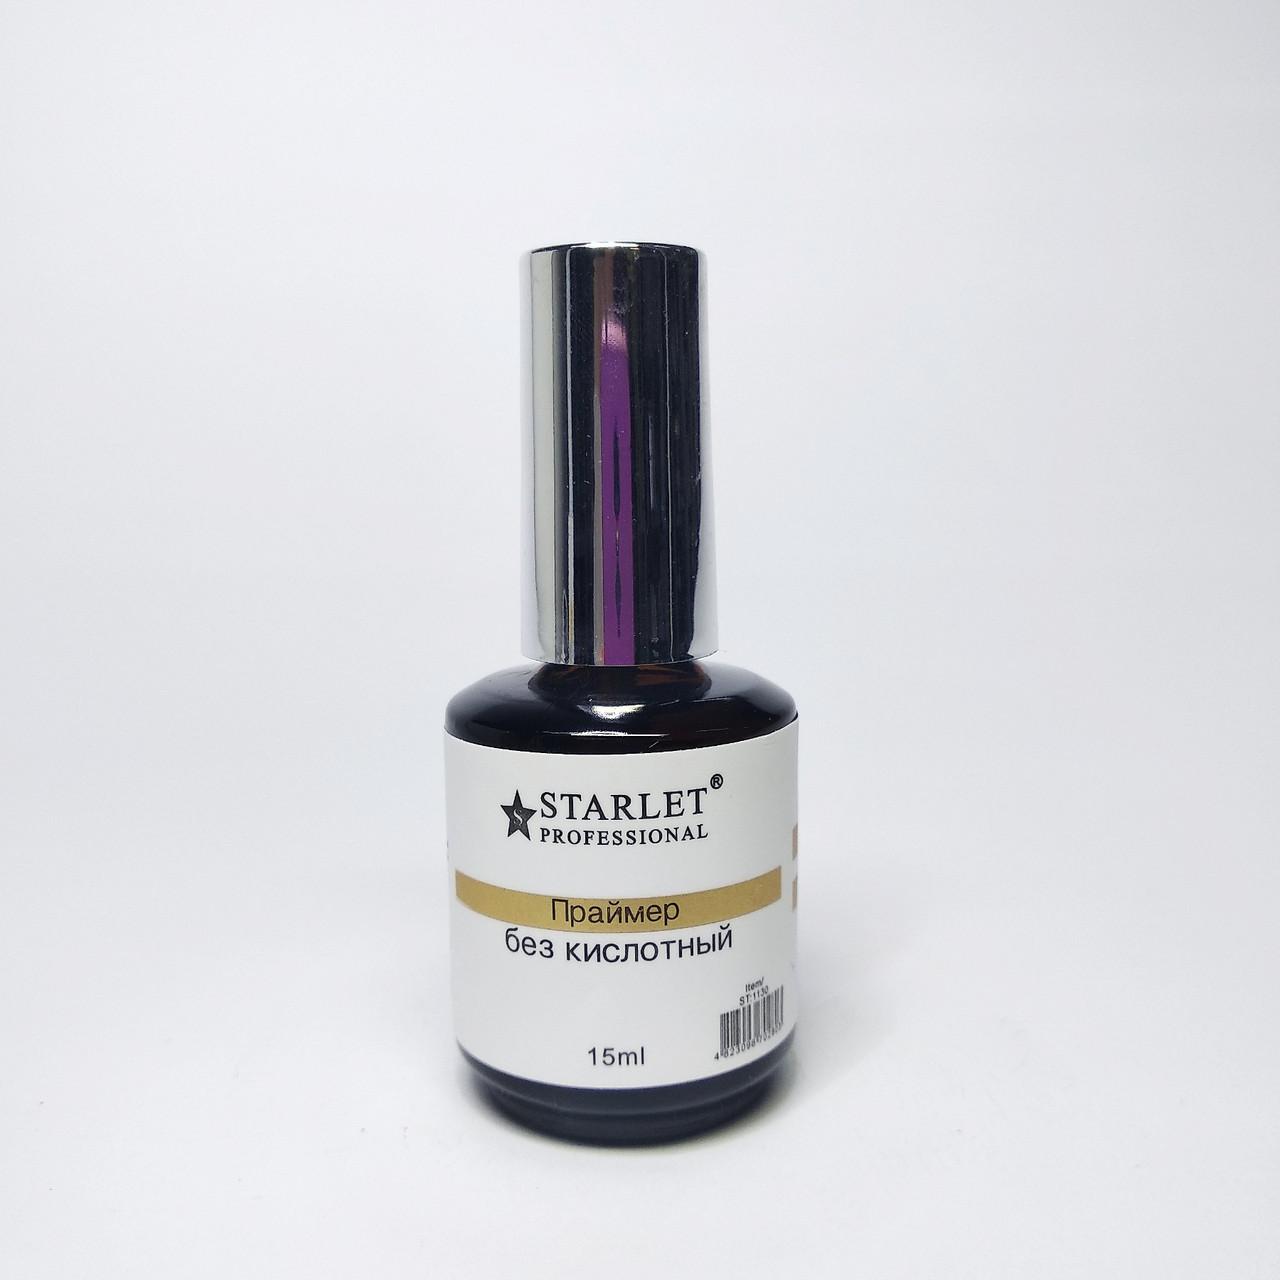 Праймер (бескислотный) STARLET Professional 15мл